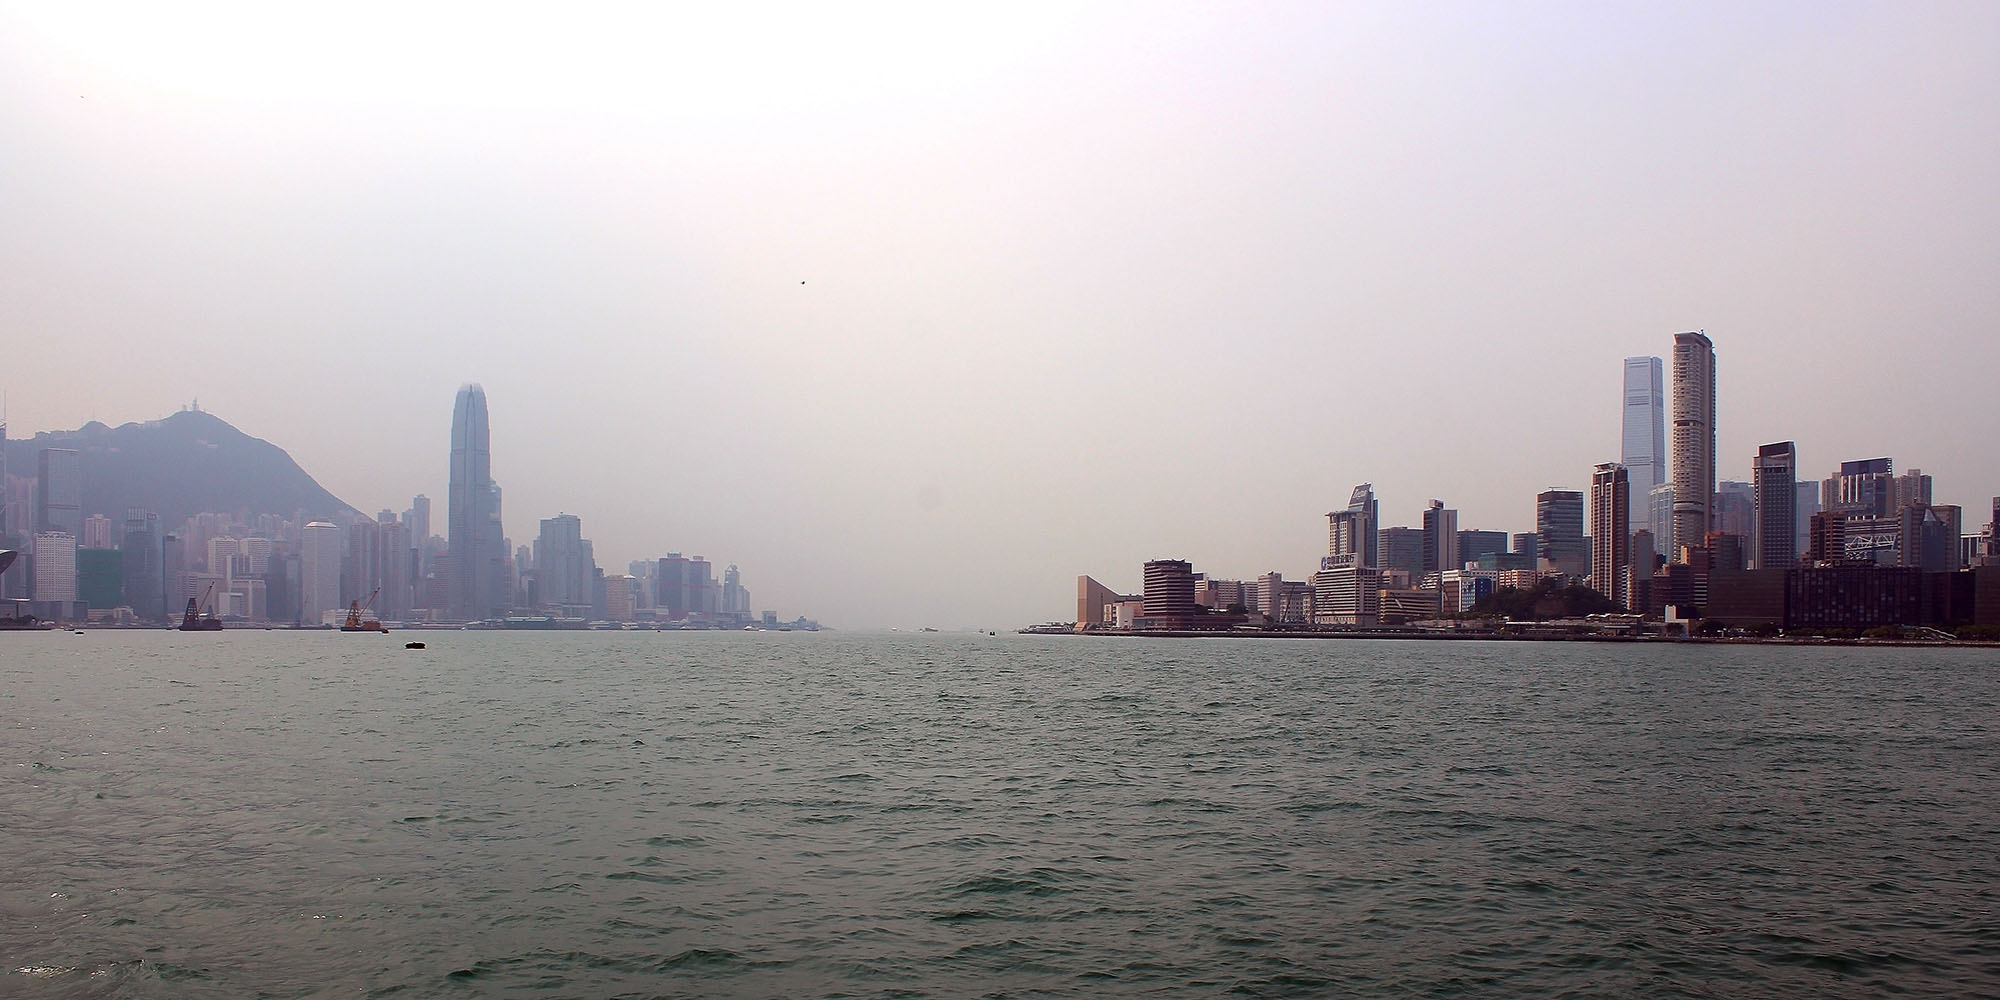 "фото ""Hong Kong from sea"" метки: панорама, пейзаж, город, China, Hong Kong, Kowlon, South china sea, seascape, Азия, Гонконг, Китай, небоскребы"